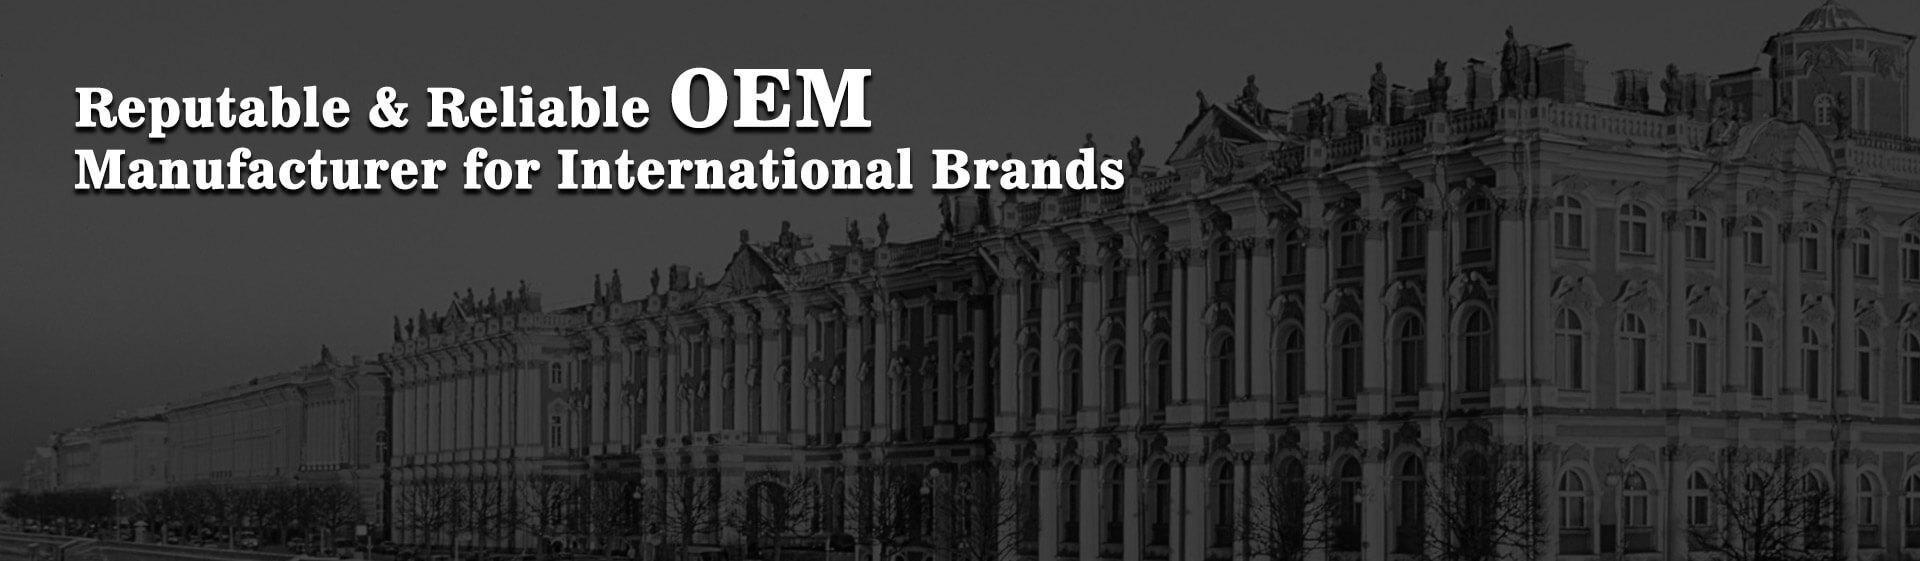 Shenzhen OEM Stainless Steel Jewelry Manufacturer